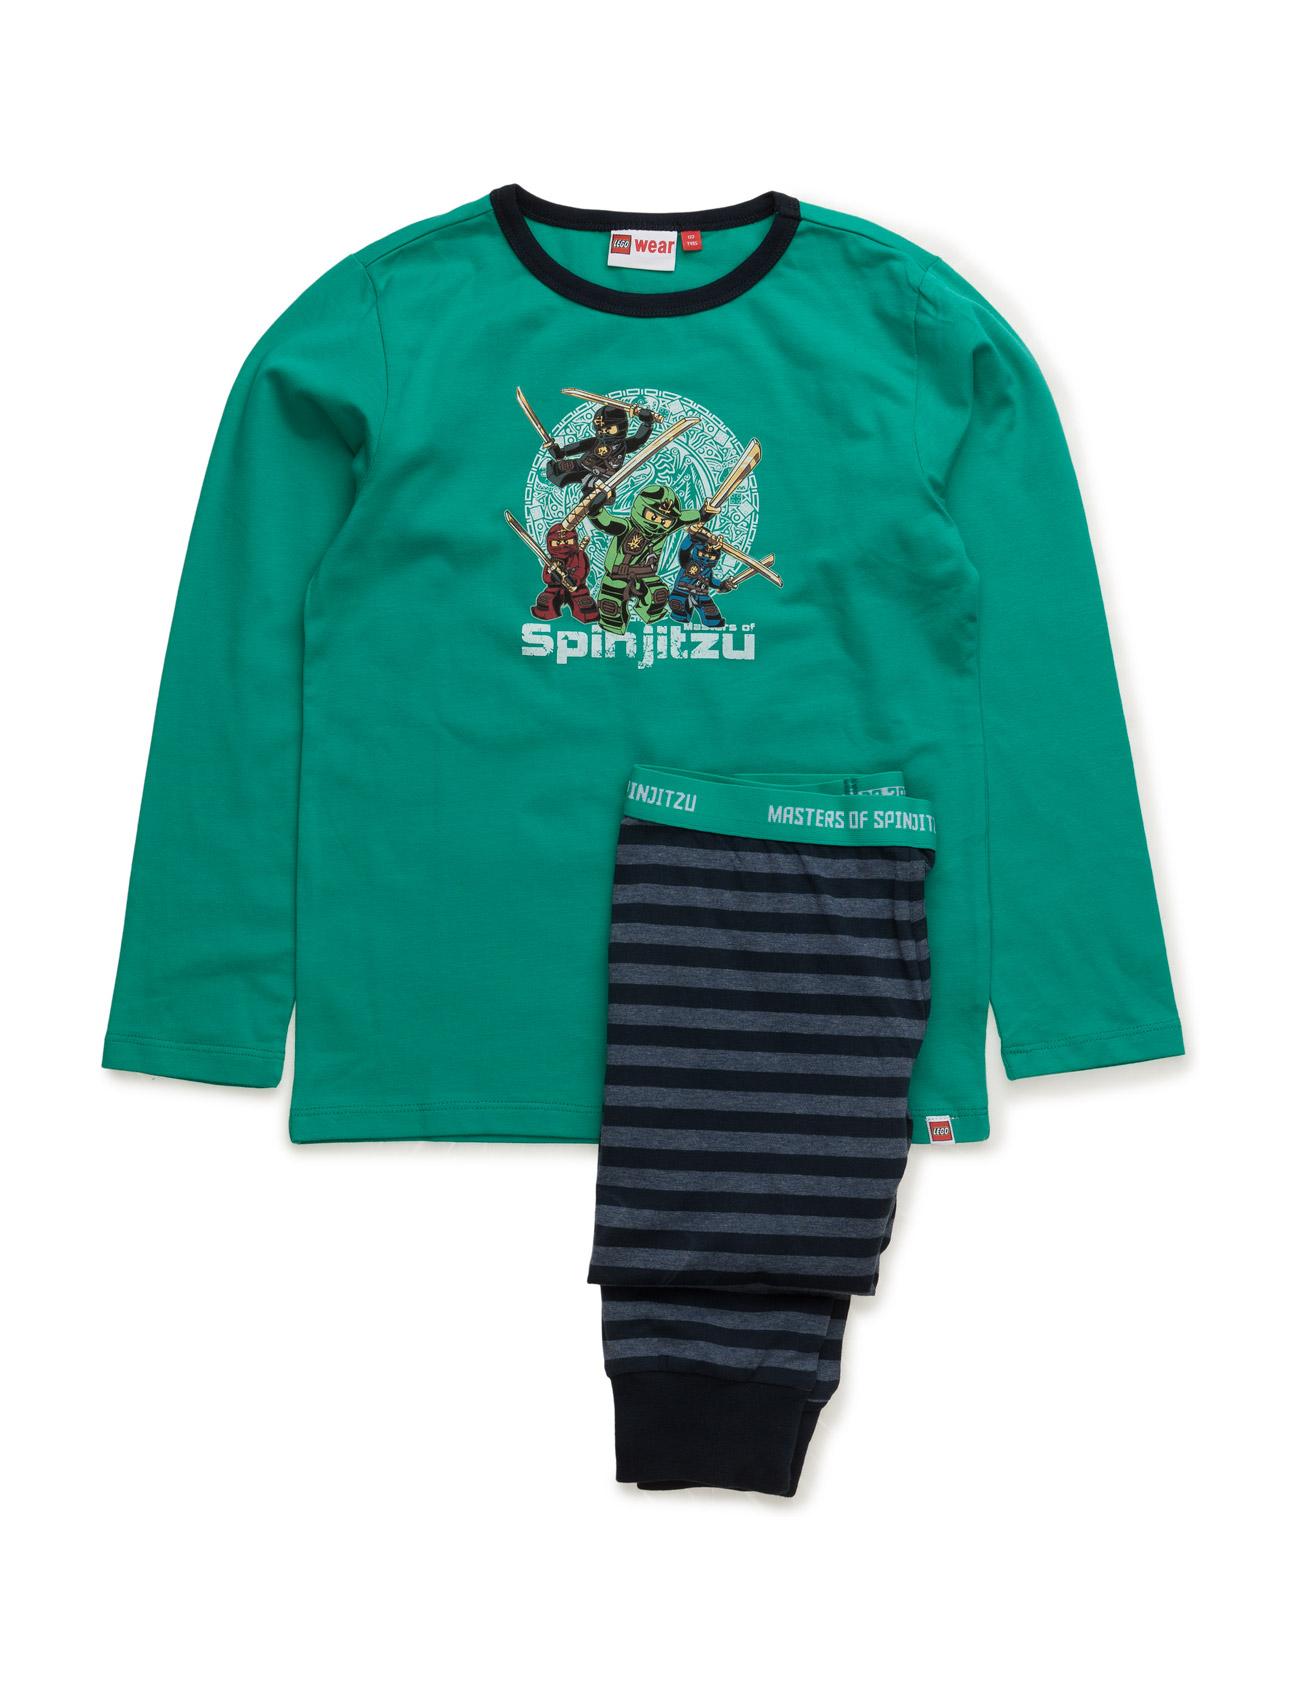 Nicolai 723- Nightwear Lego wear Pyjamas til Børn i